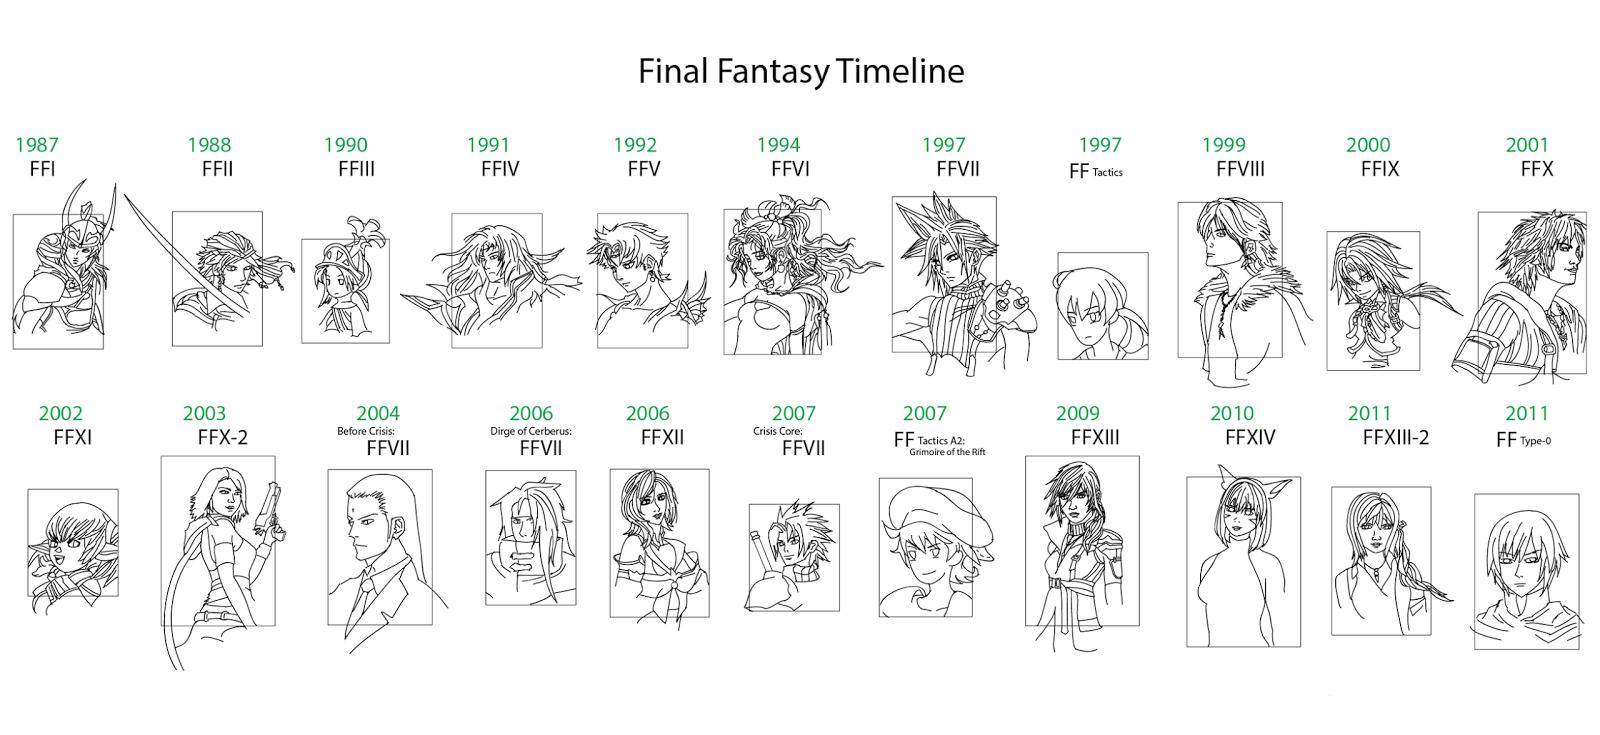 Final Fantasy Timeline Gabriel I Arroyo